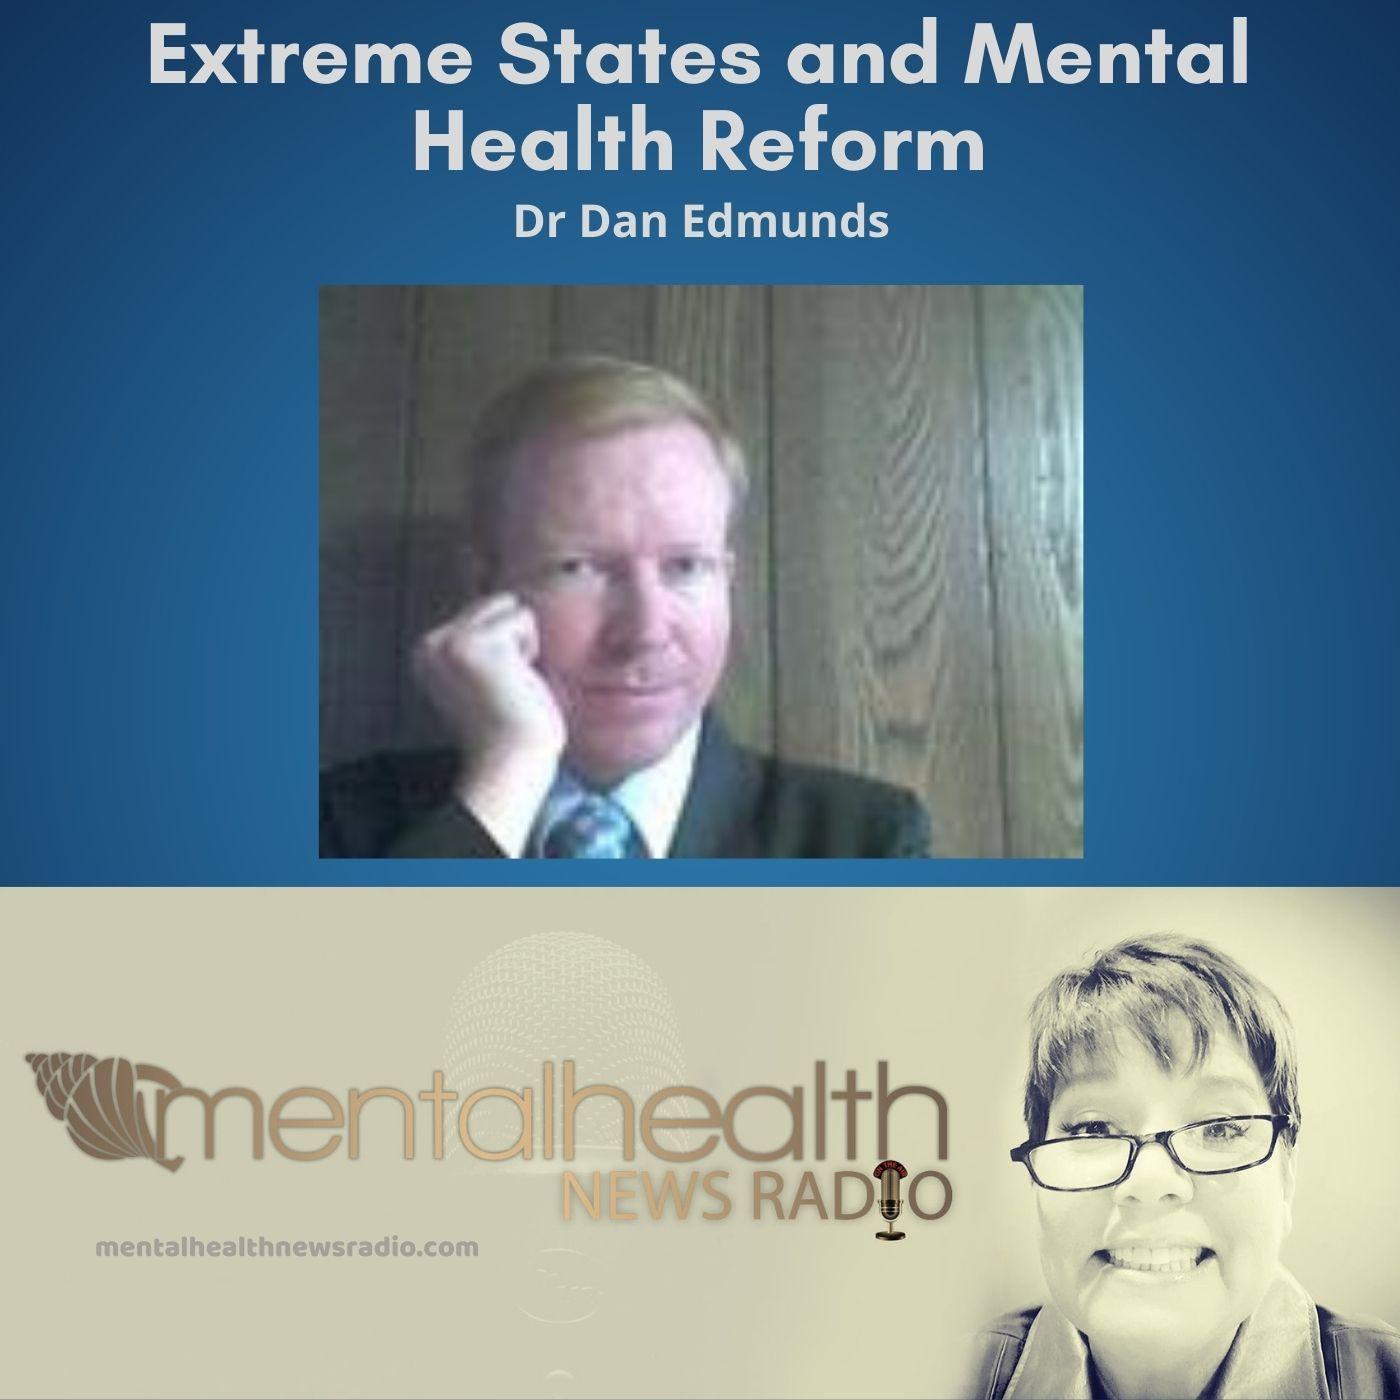 Mental Health News Radio - Extreme States and Mental Health Reform